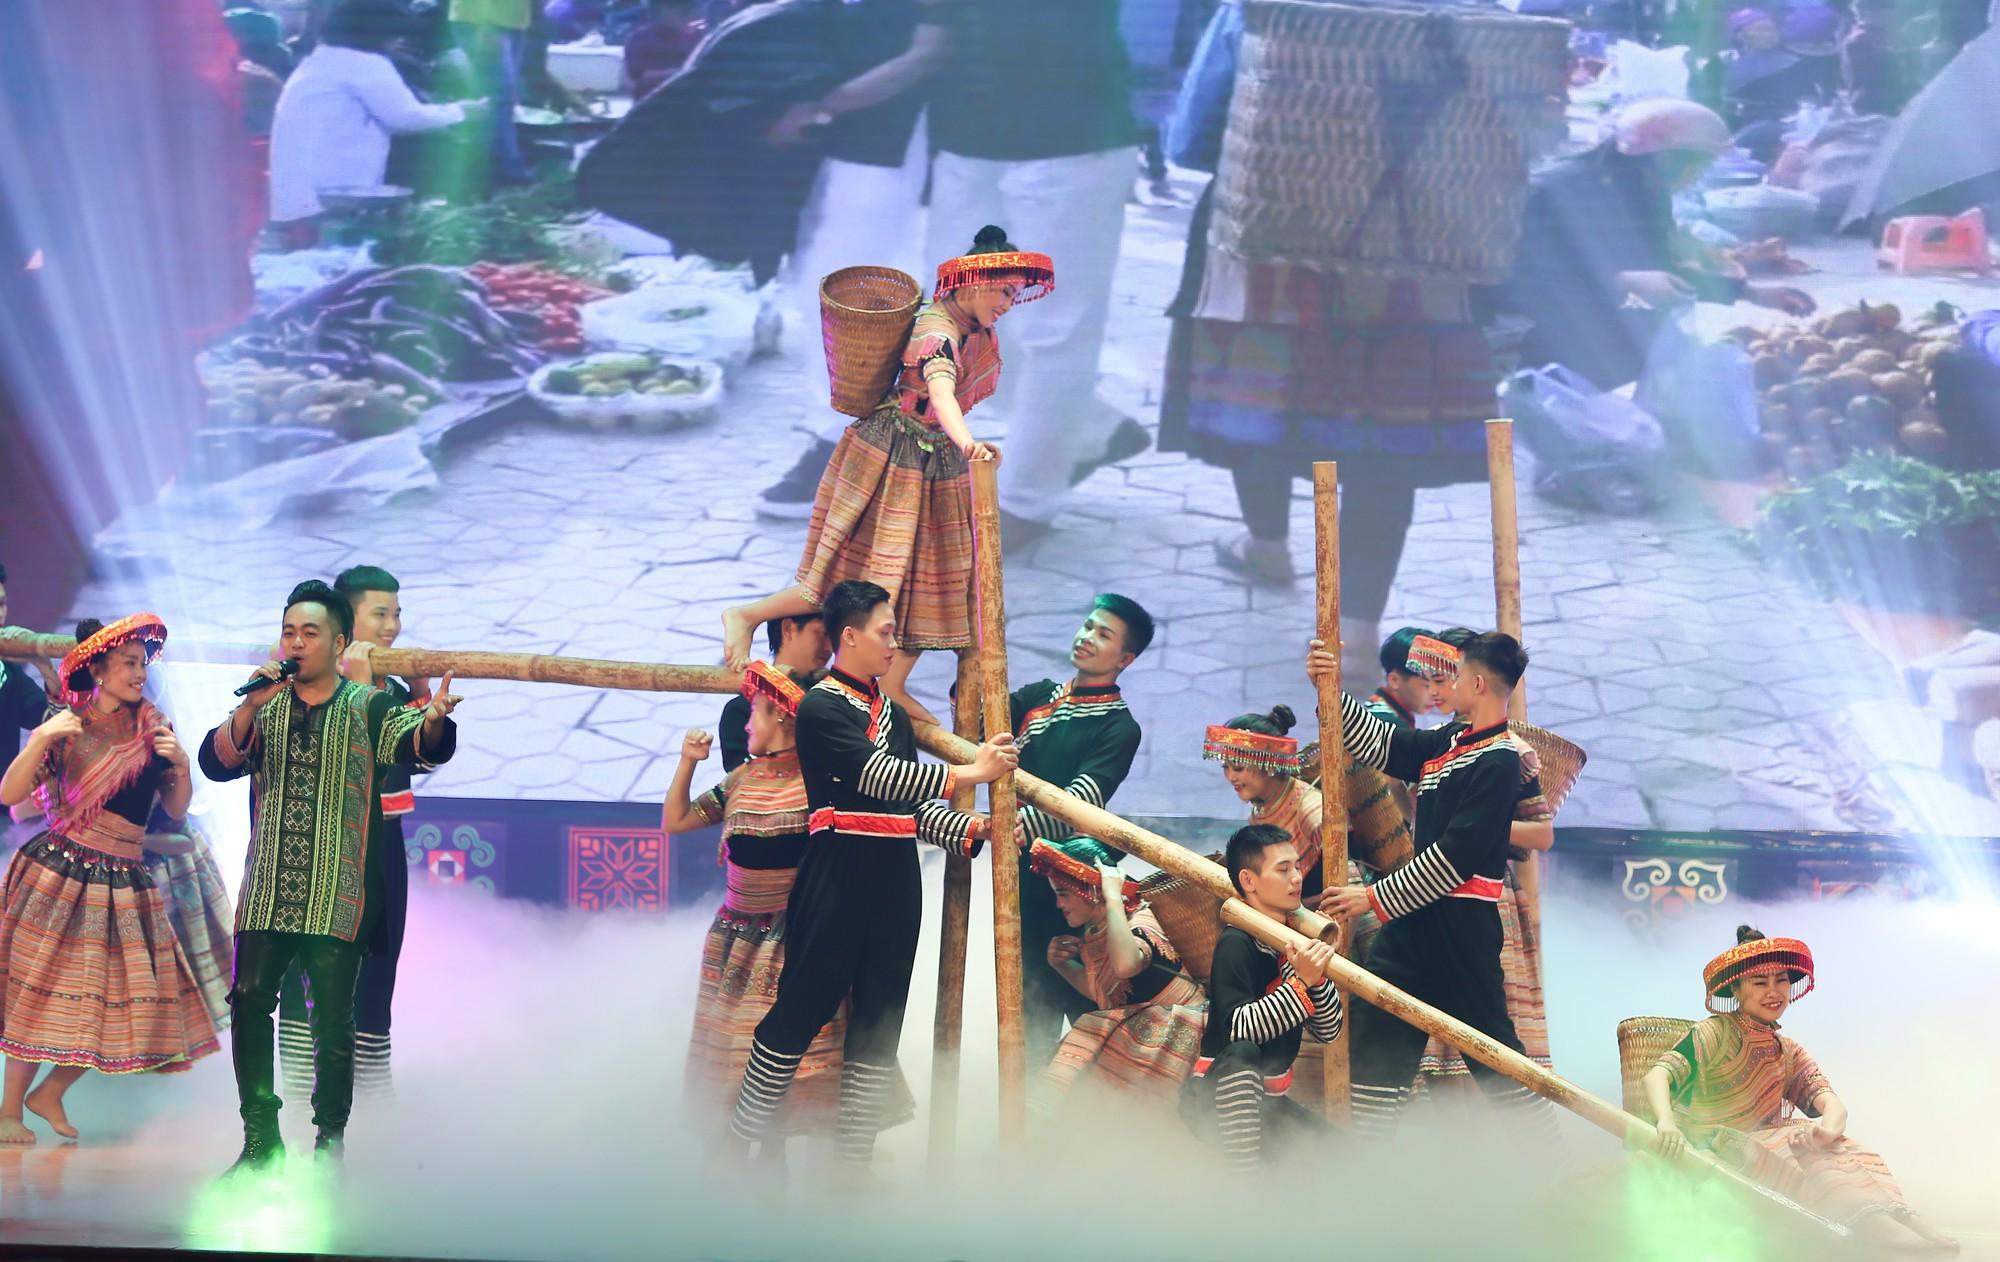 Festival introduces northwestern ethnic culture